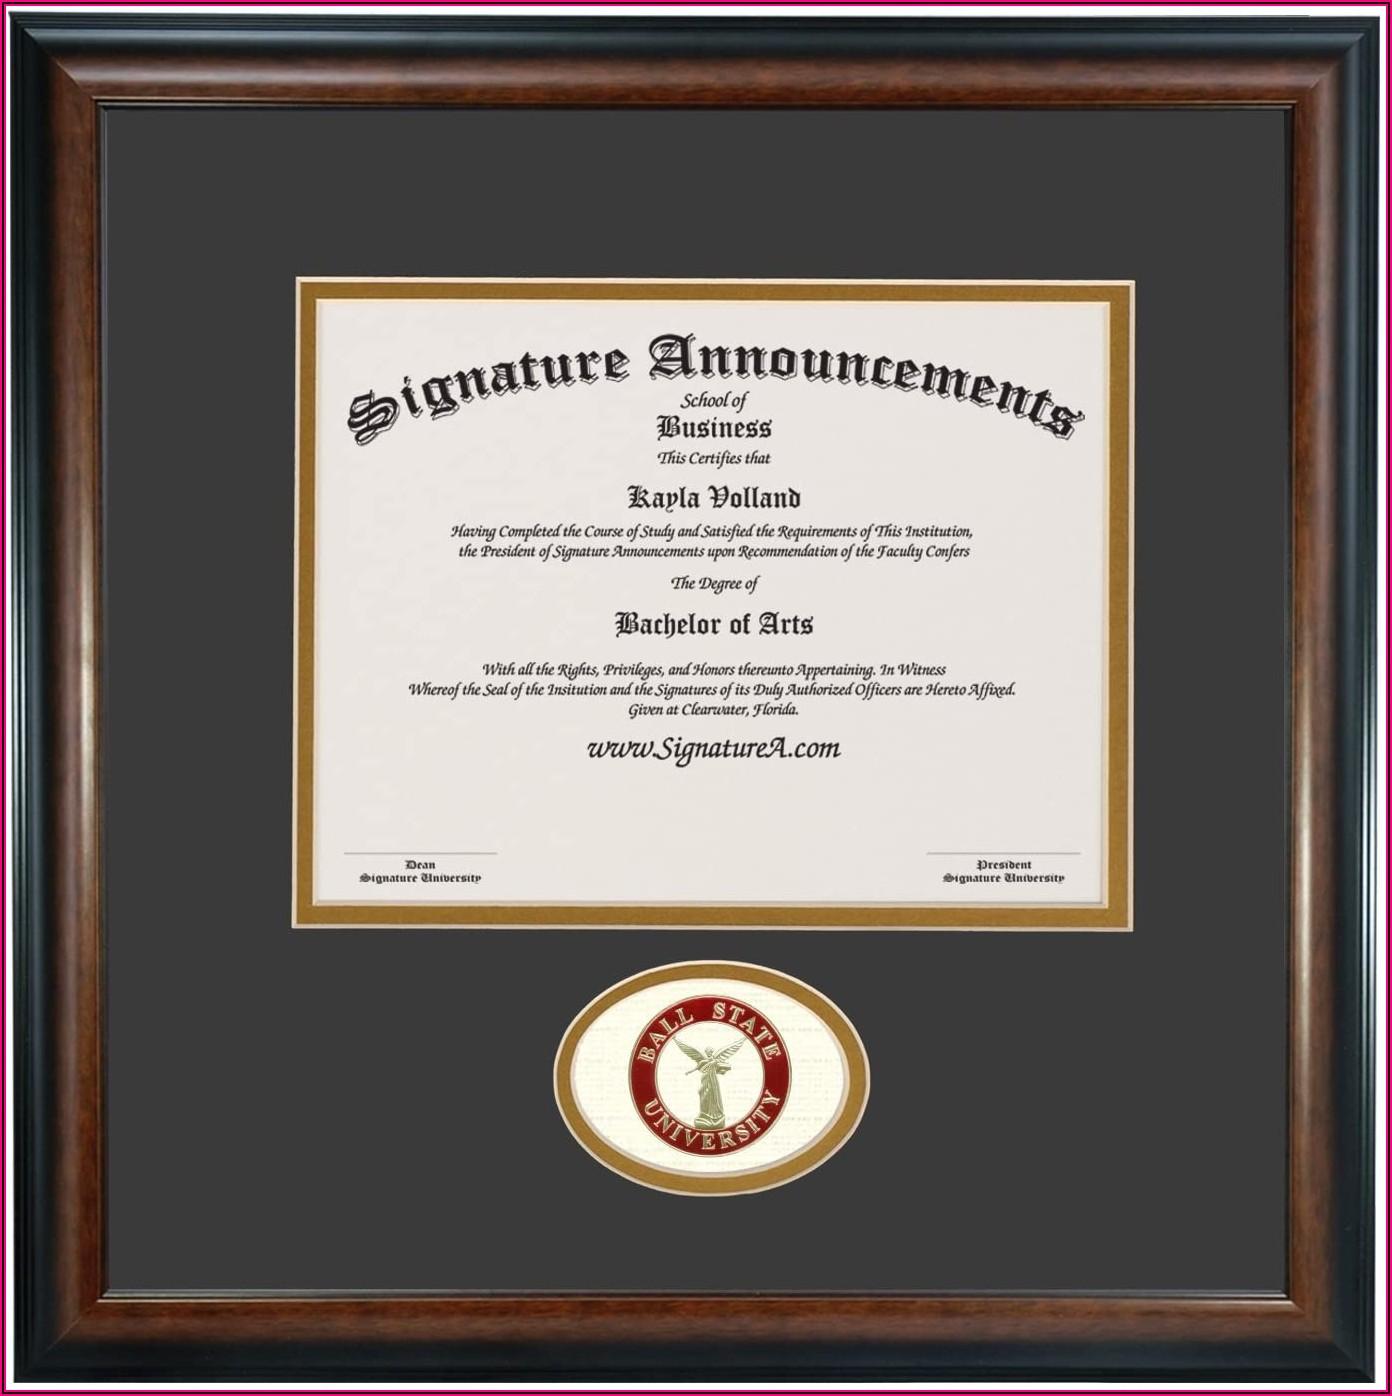 Ball State University Graduation Announcements